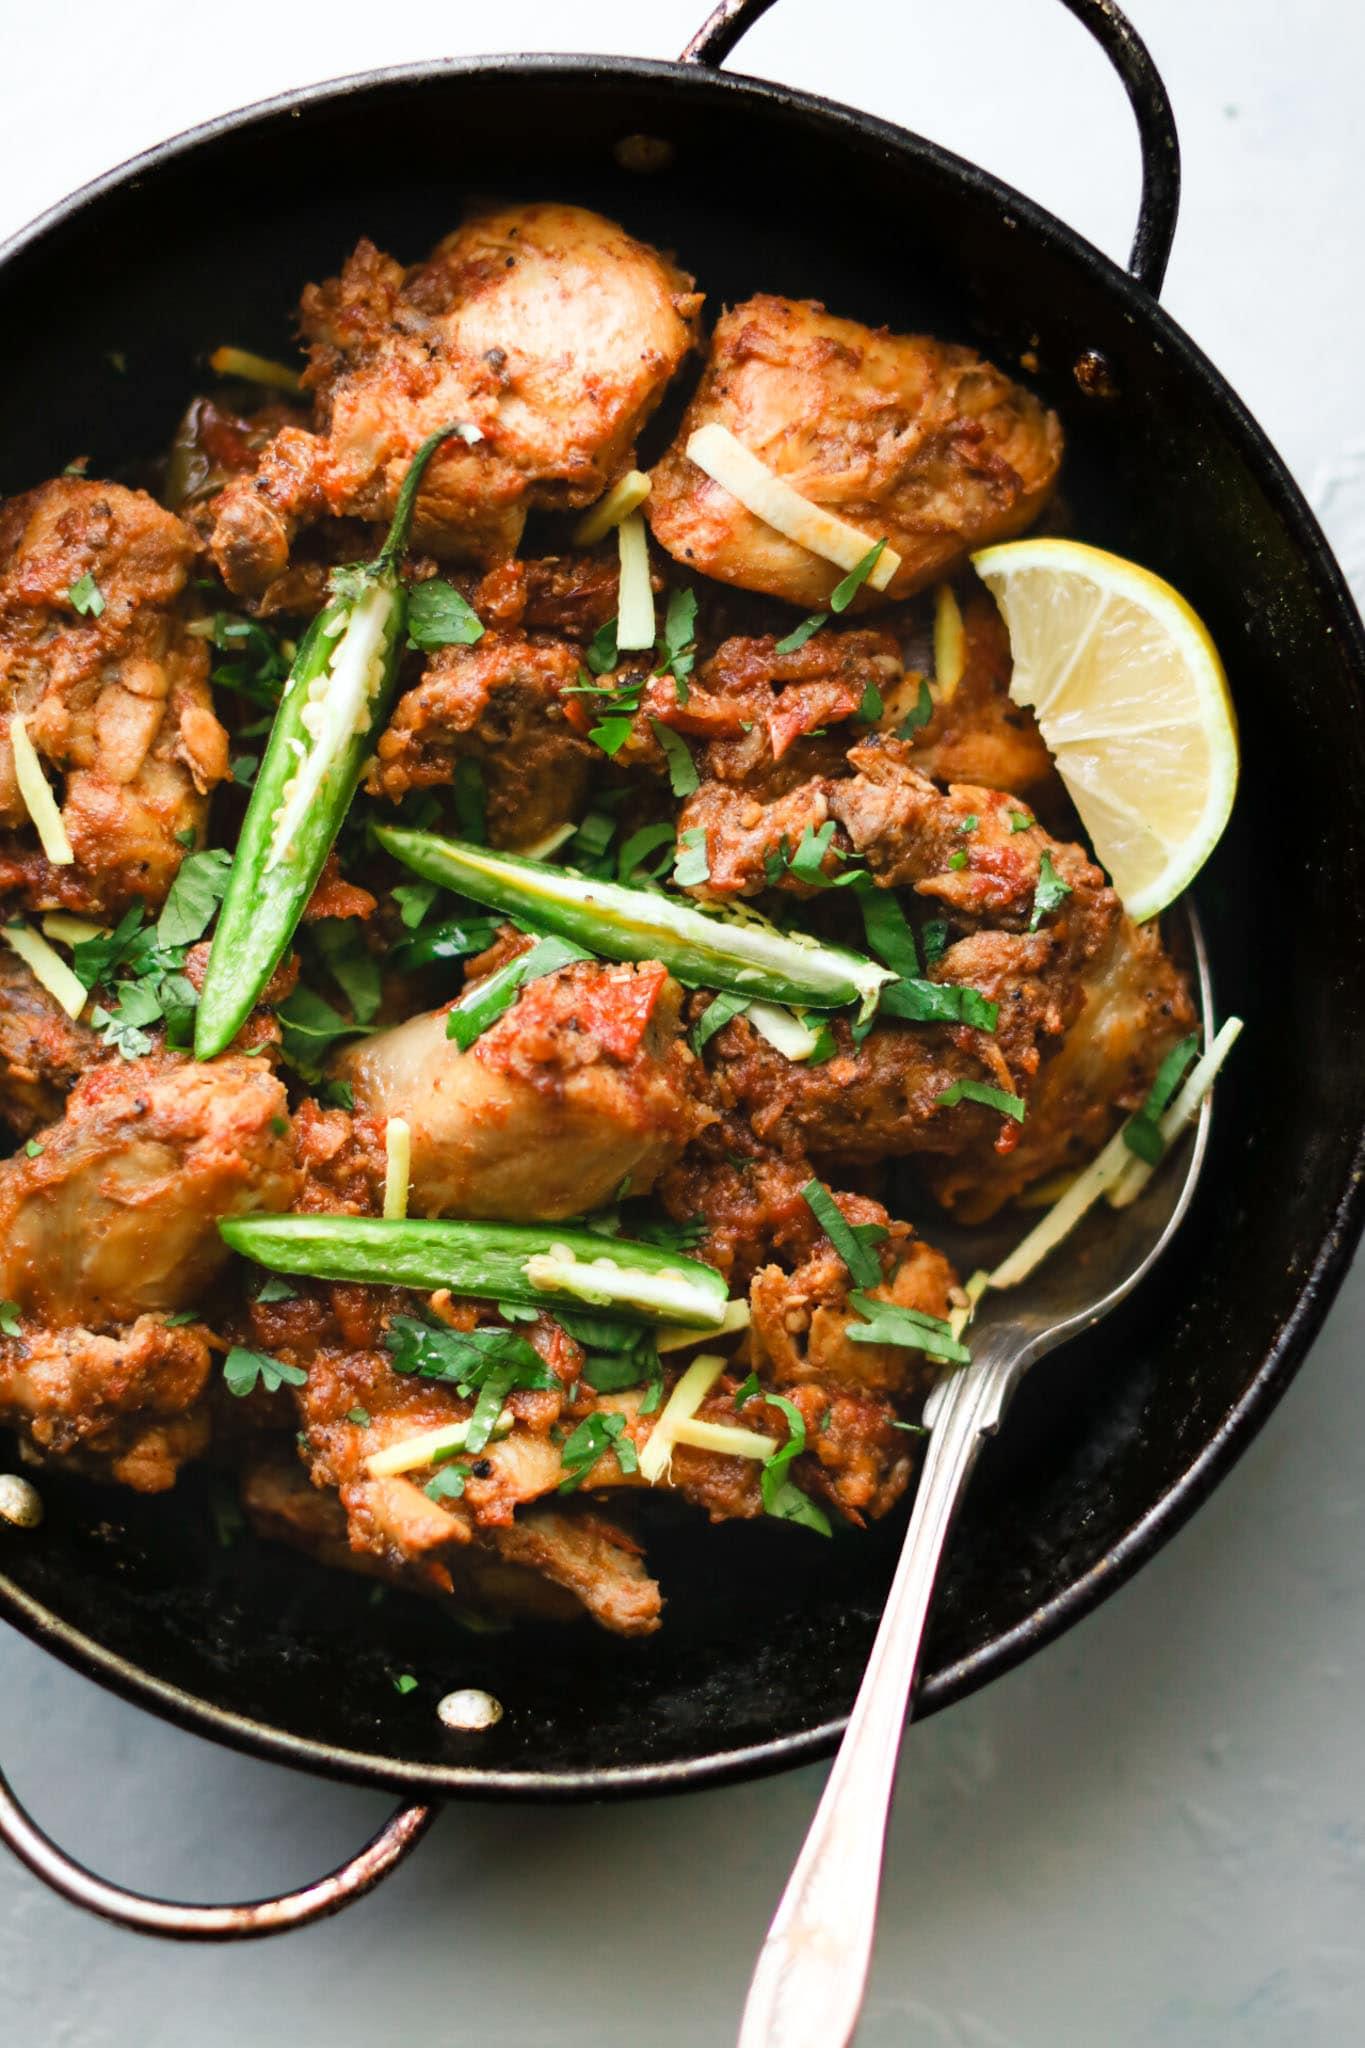 Close up of chicken karahi in a black karahi